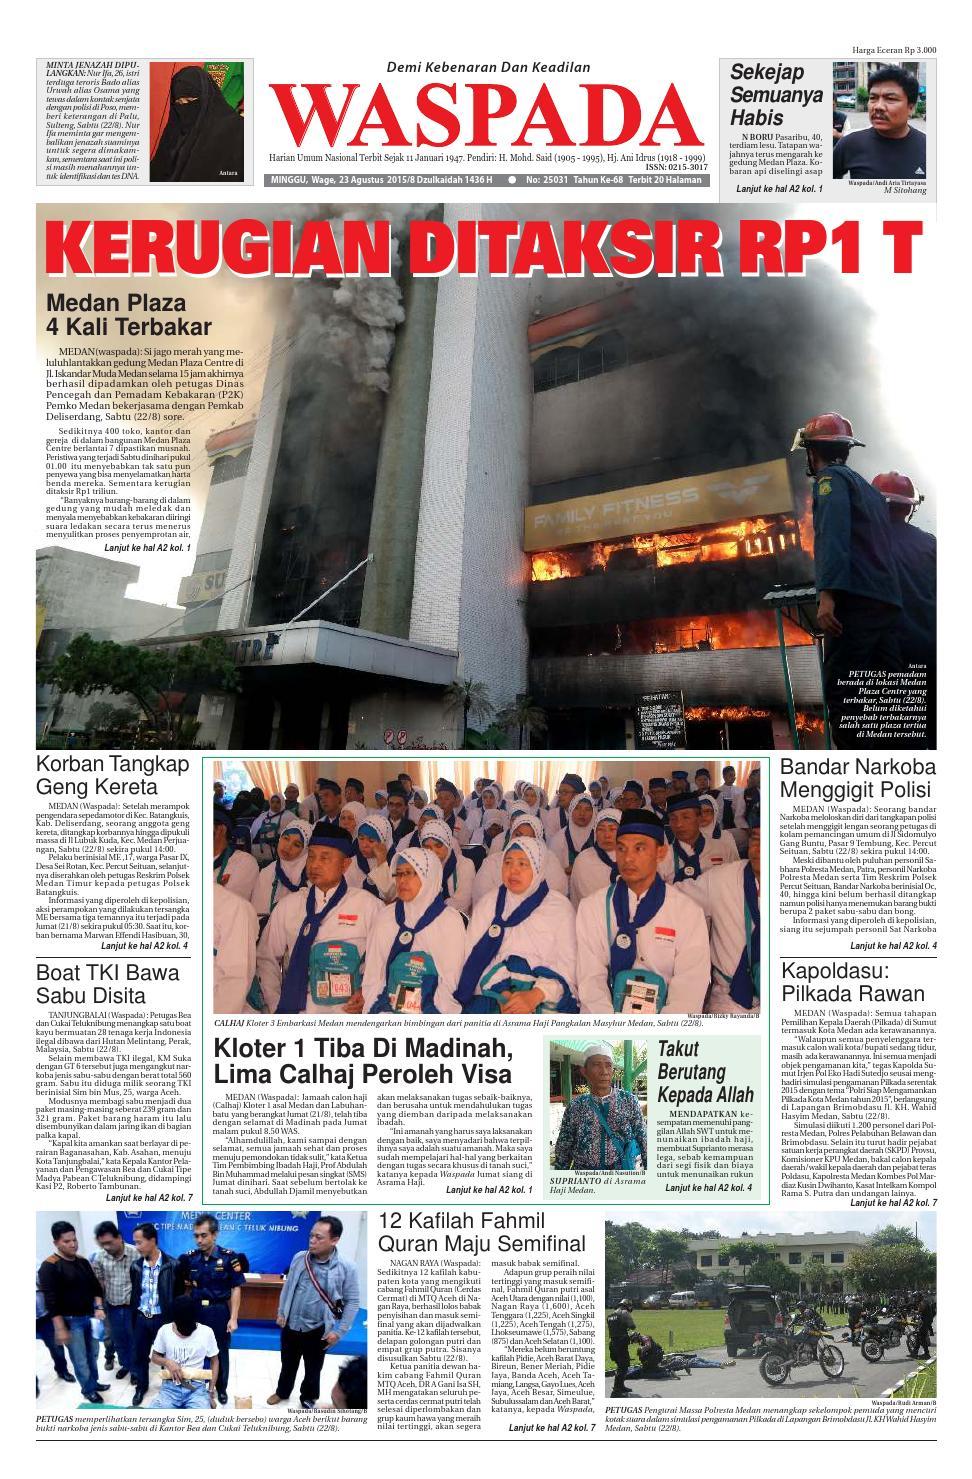 Waspada Minggu 23 Agustus 2015 By Harian Issuu Zaskia Mecca Fae Tunik Tembaga